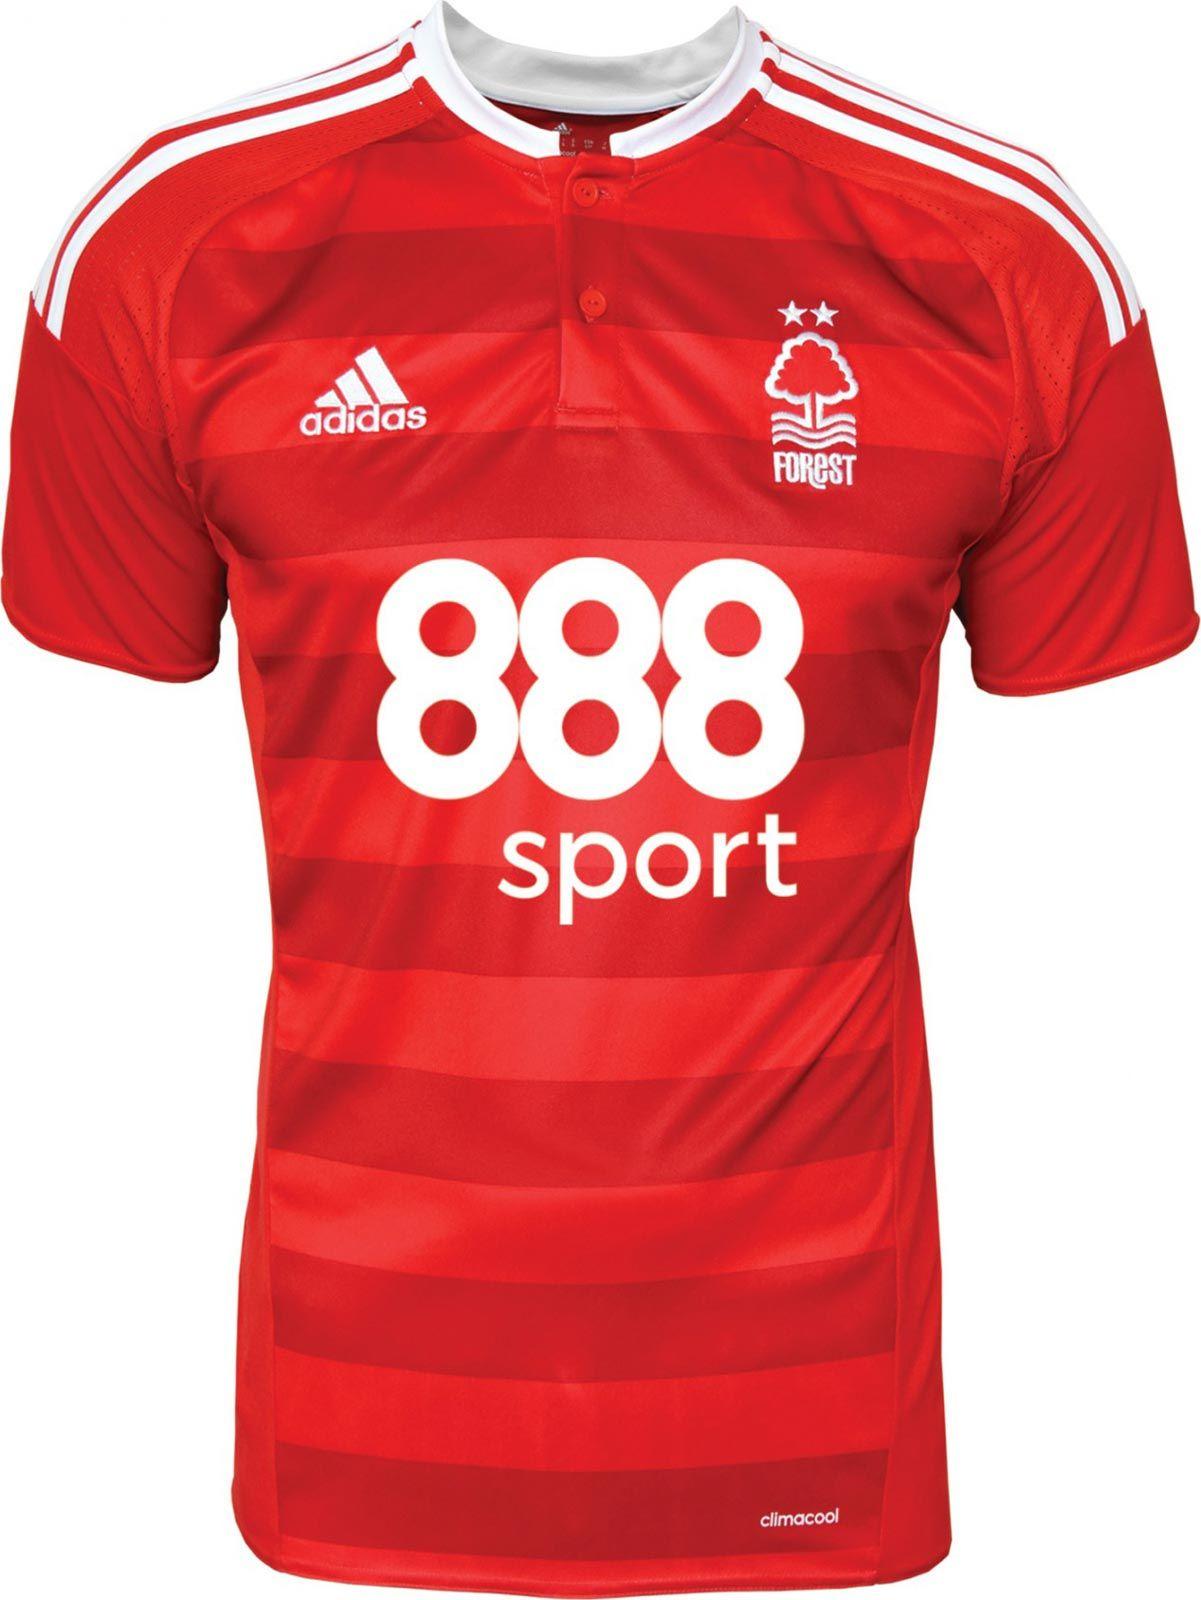 bc9897c6bbe0c Nottingham Forest home kit 2016 17